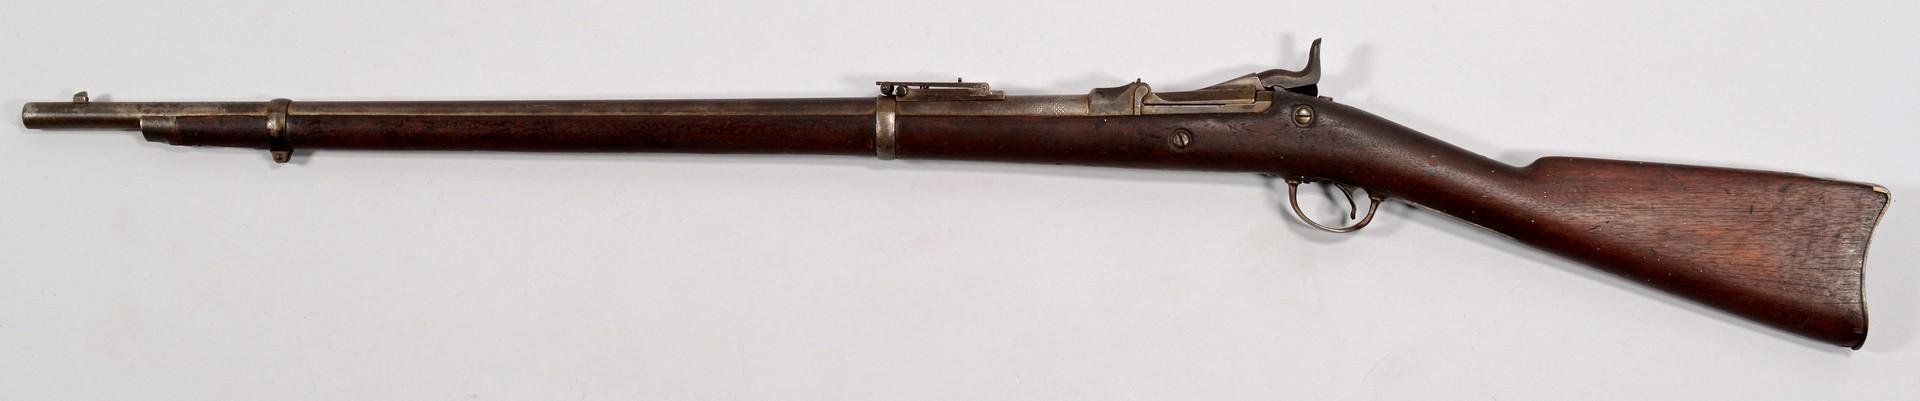 Lot 543: U.S. Model 1884 Springfield Cadet Rifle